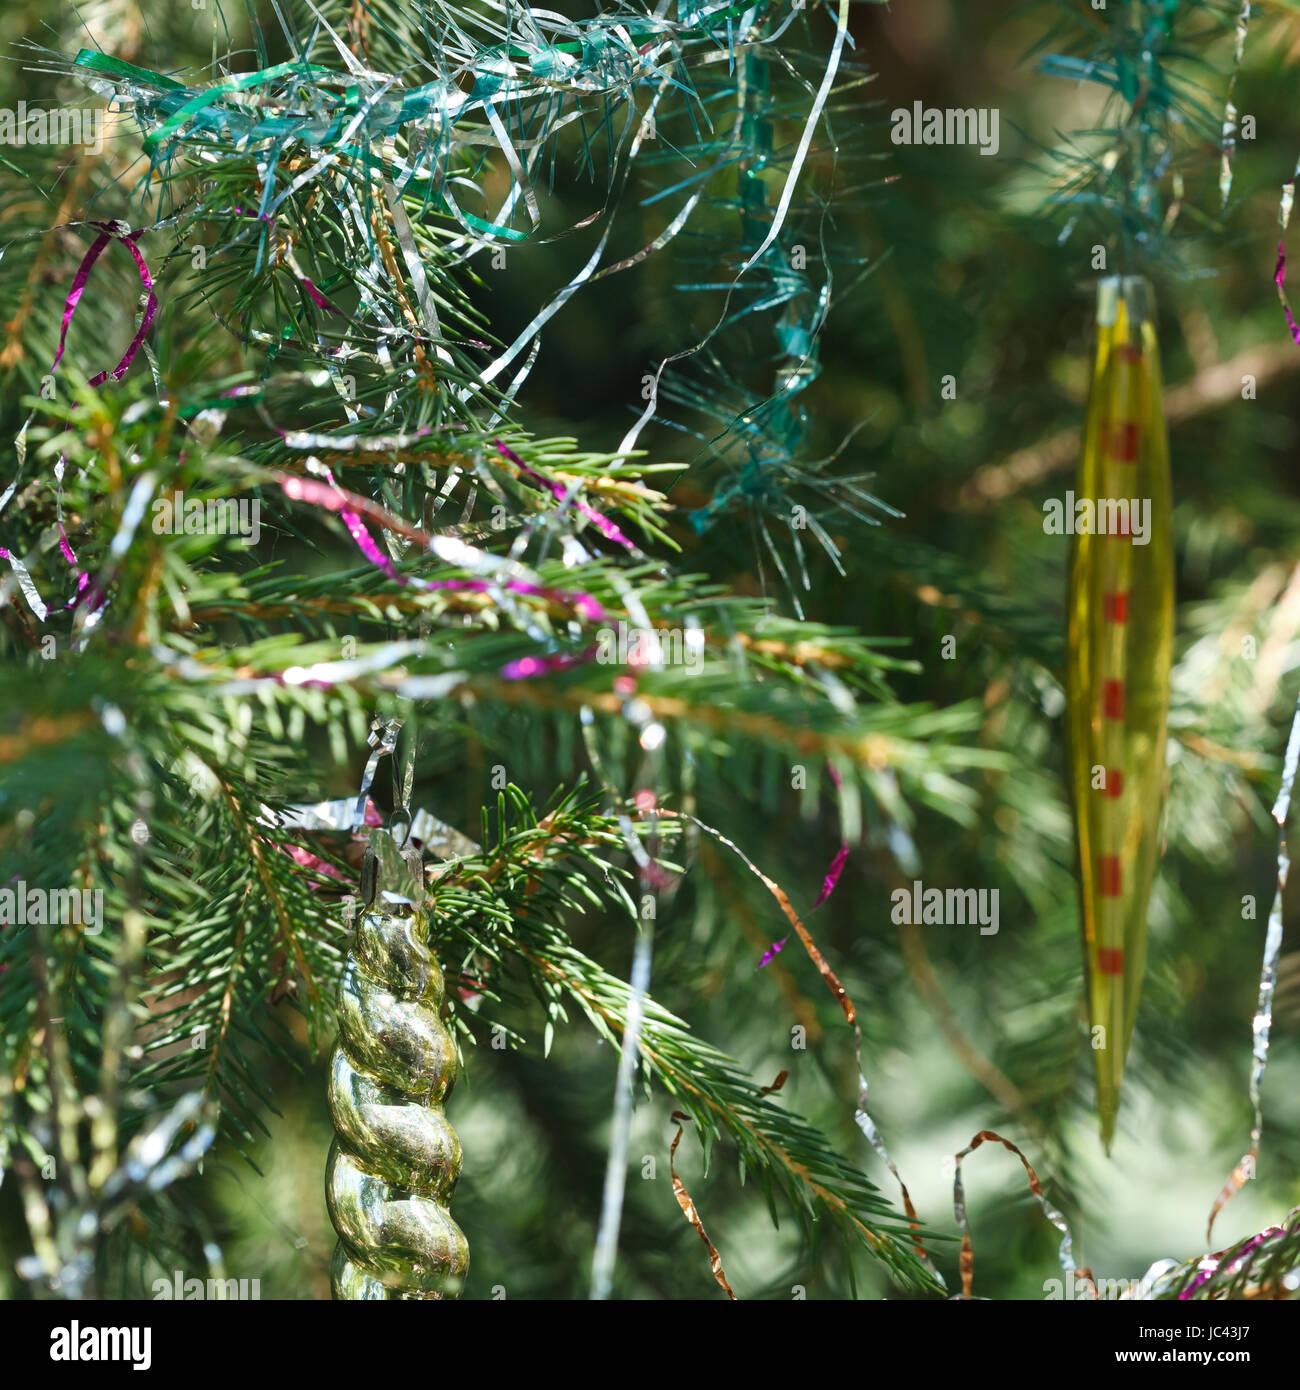 vintage icicles christmas tree decoration close up stock image - Icicles For Christmas Tree